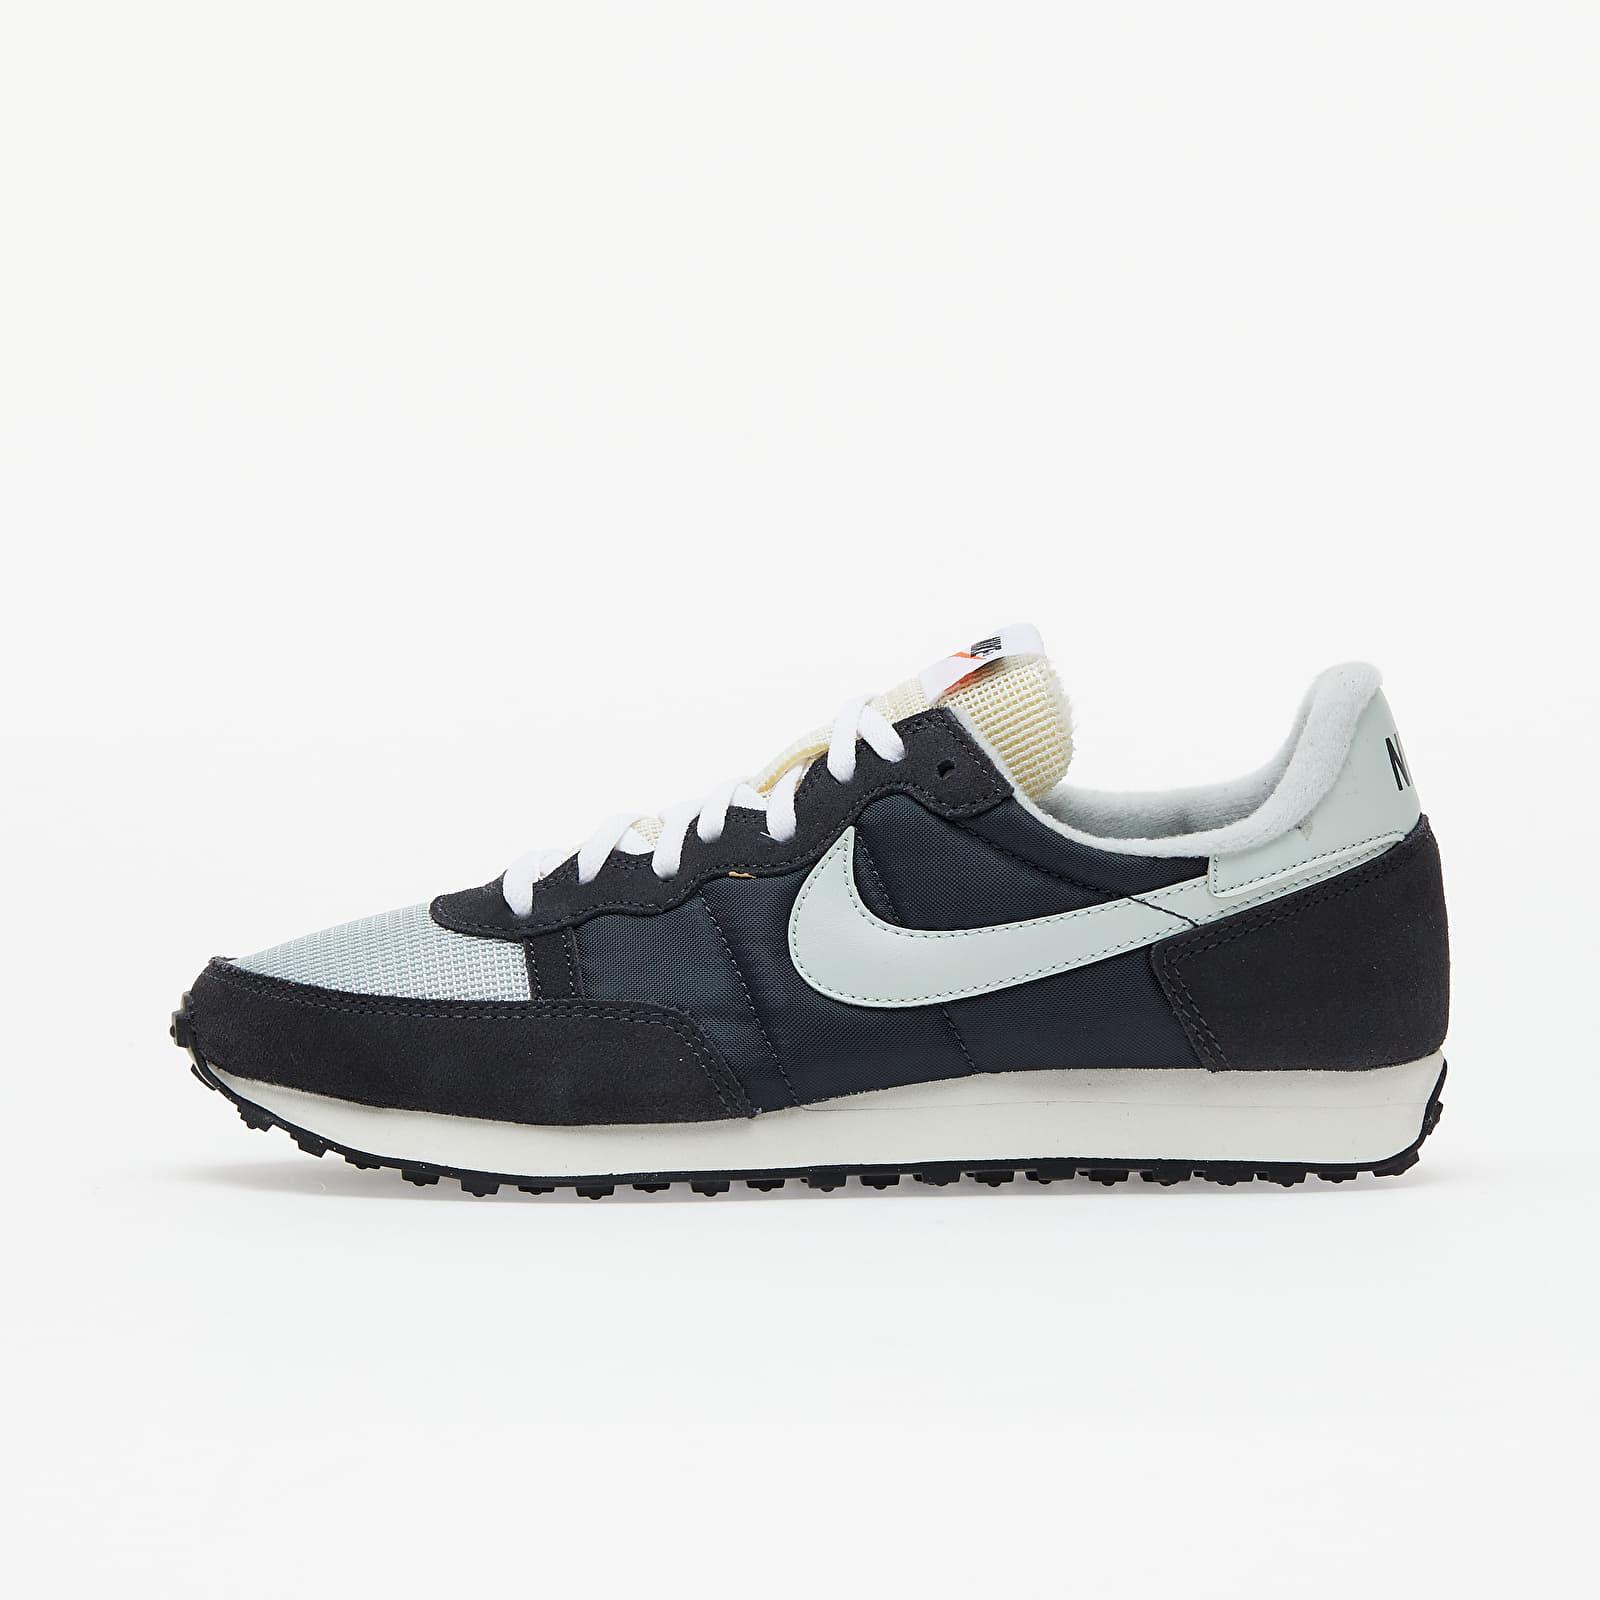 Nike Challenger OG Off Noir/ Light Silver-Dk Smoke Grey CW7645-007